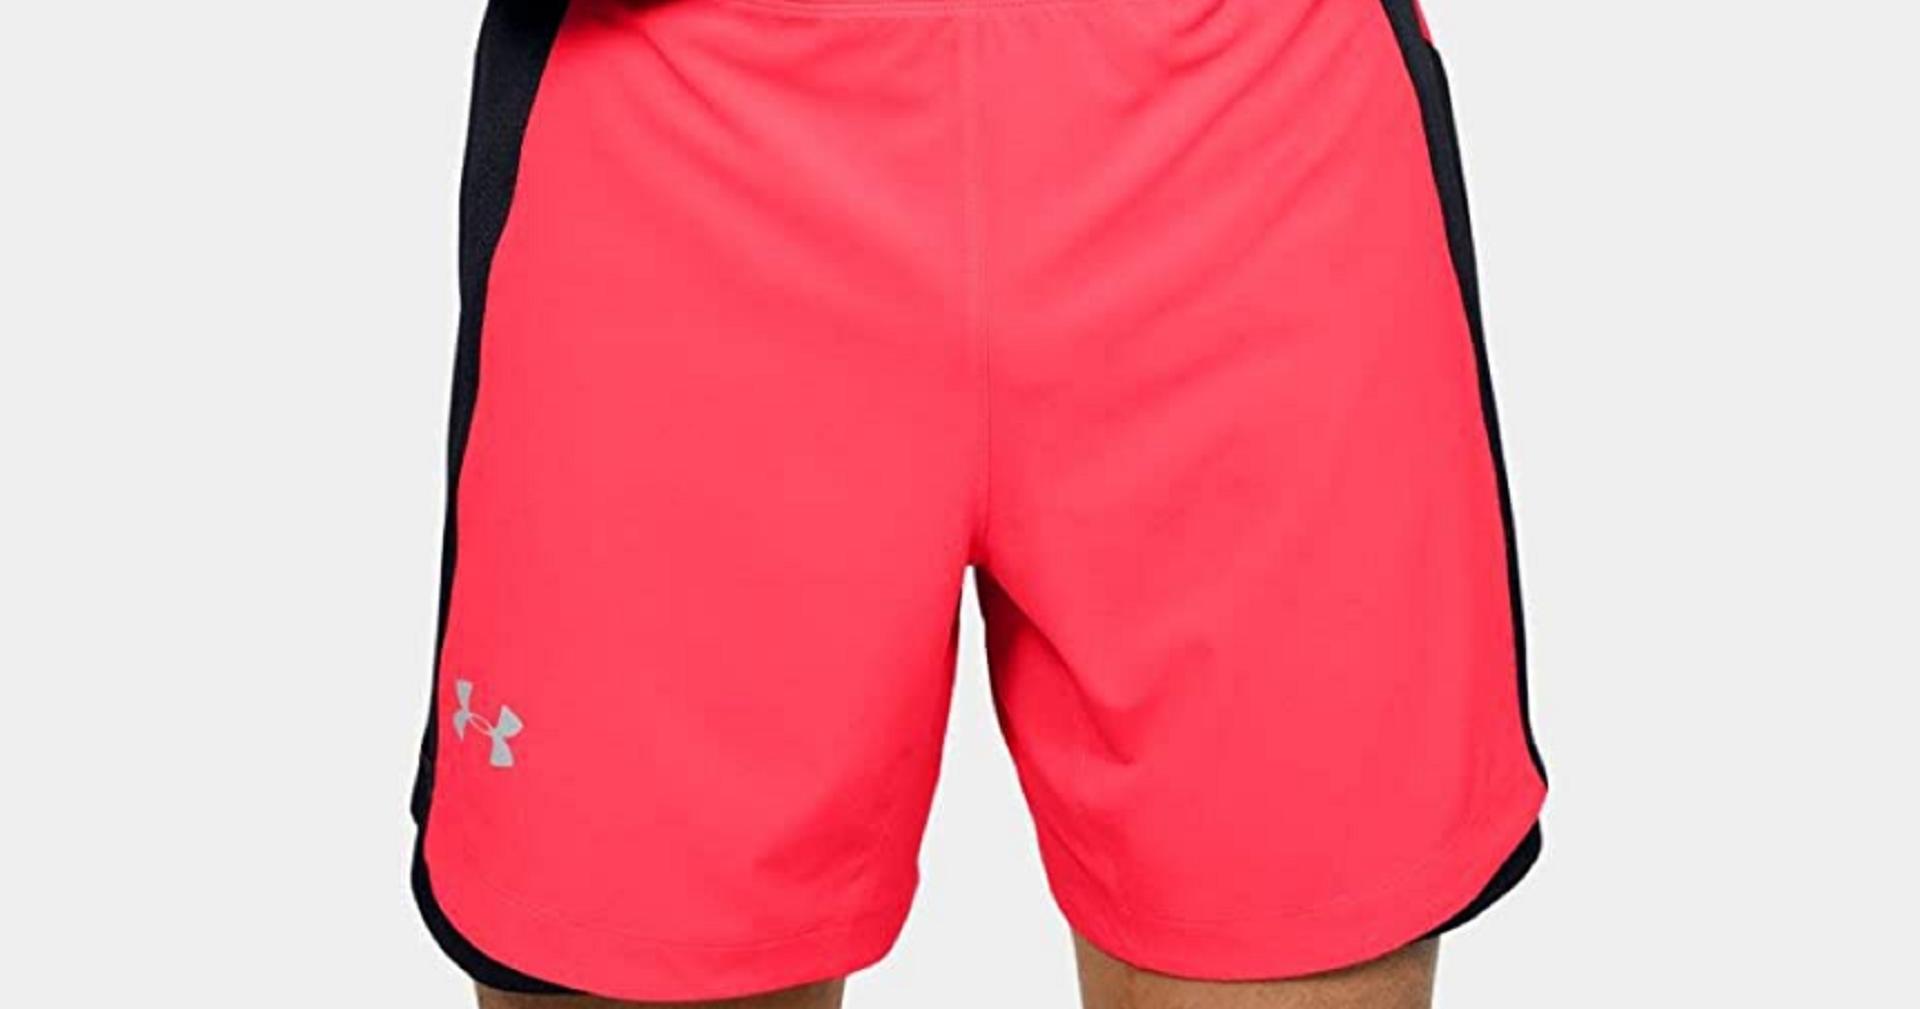 under armour men's running shorts